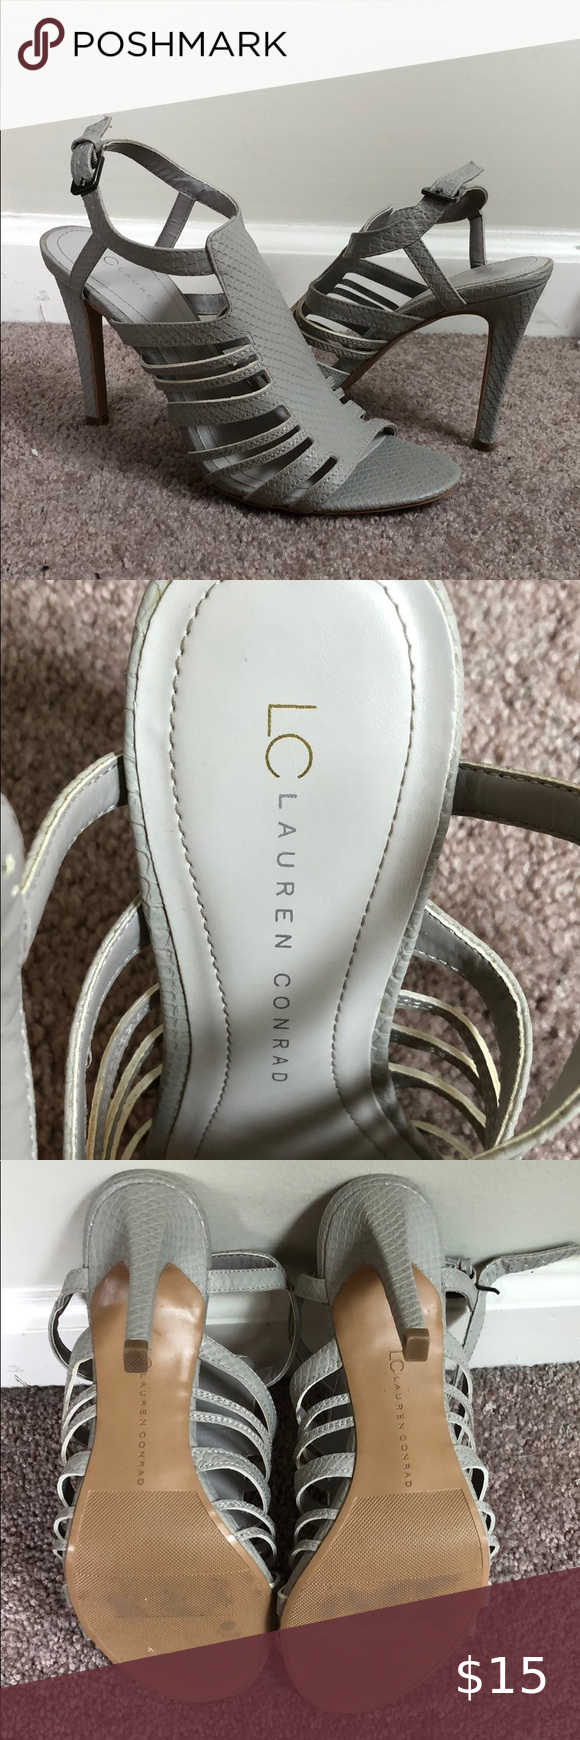 lc lauren conrad shoes Sz 6 | eBay